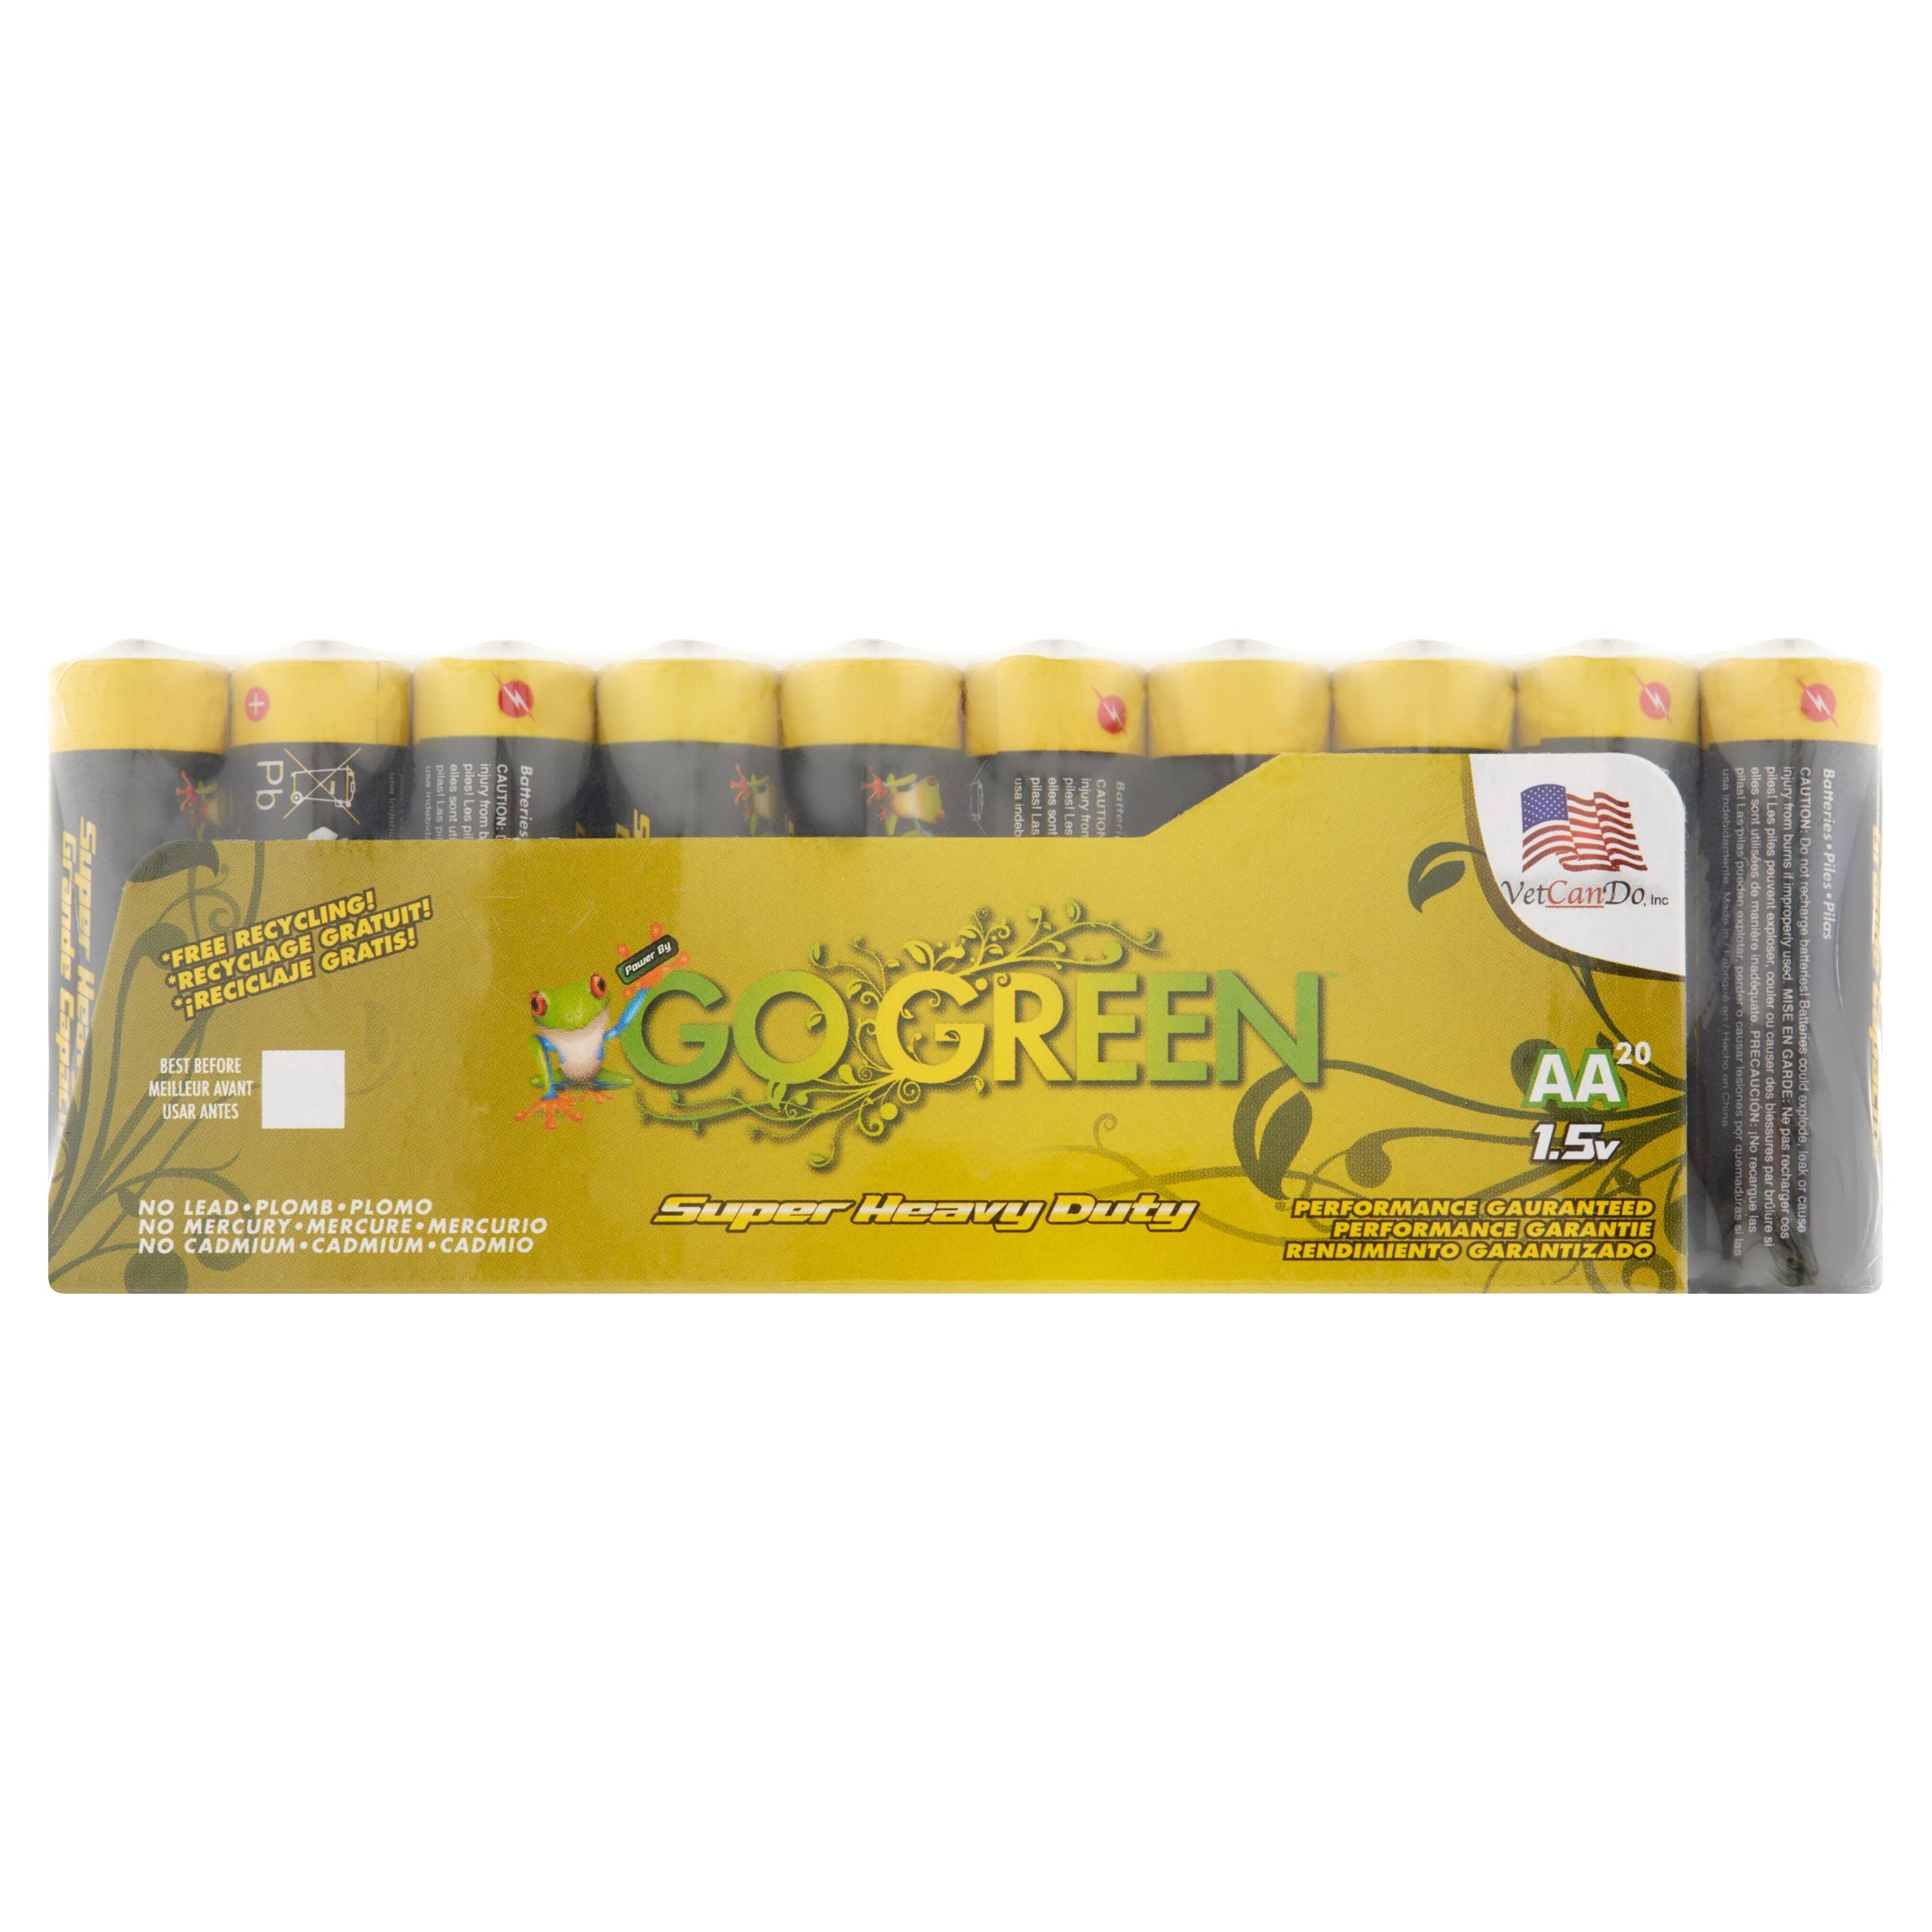 Go Green Heavy Duty AA Batteries, 20 Count